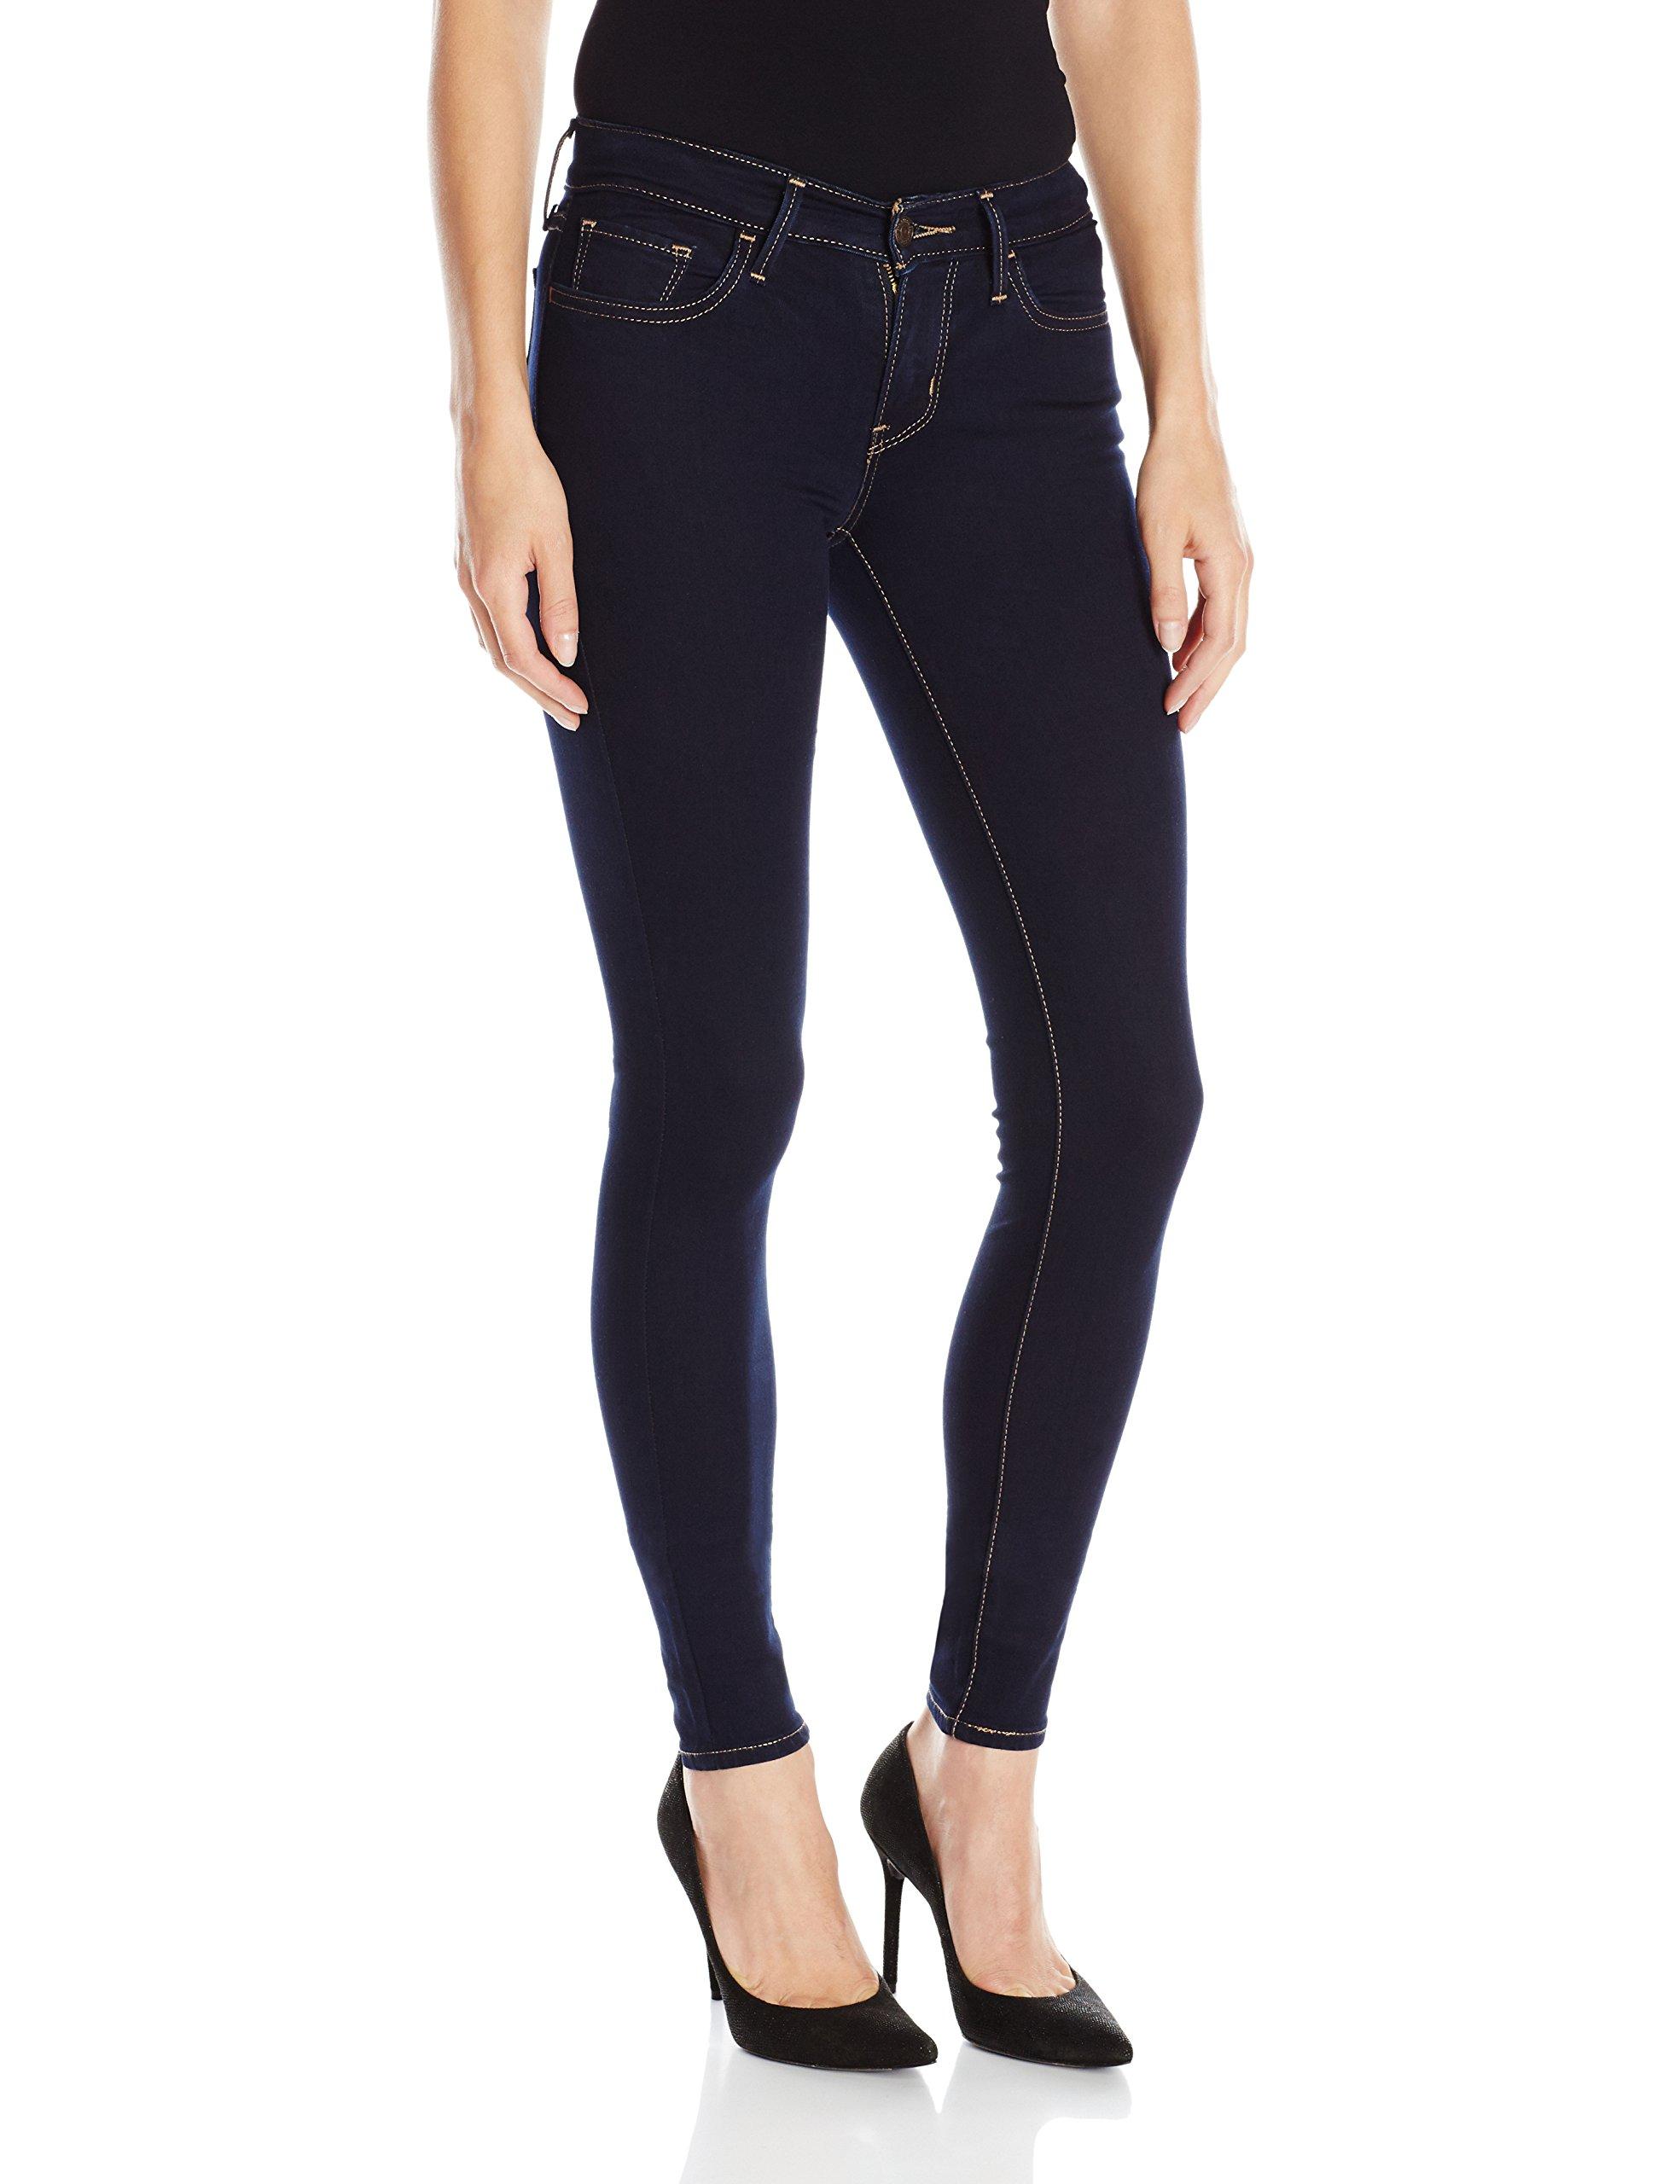 Levi's Women's 710 Super Skinny Jean, Dusk Rinse, 28 (US 6) S